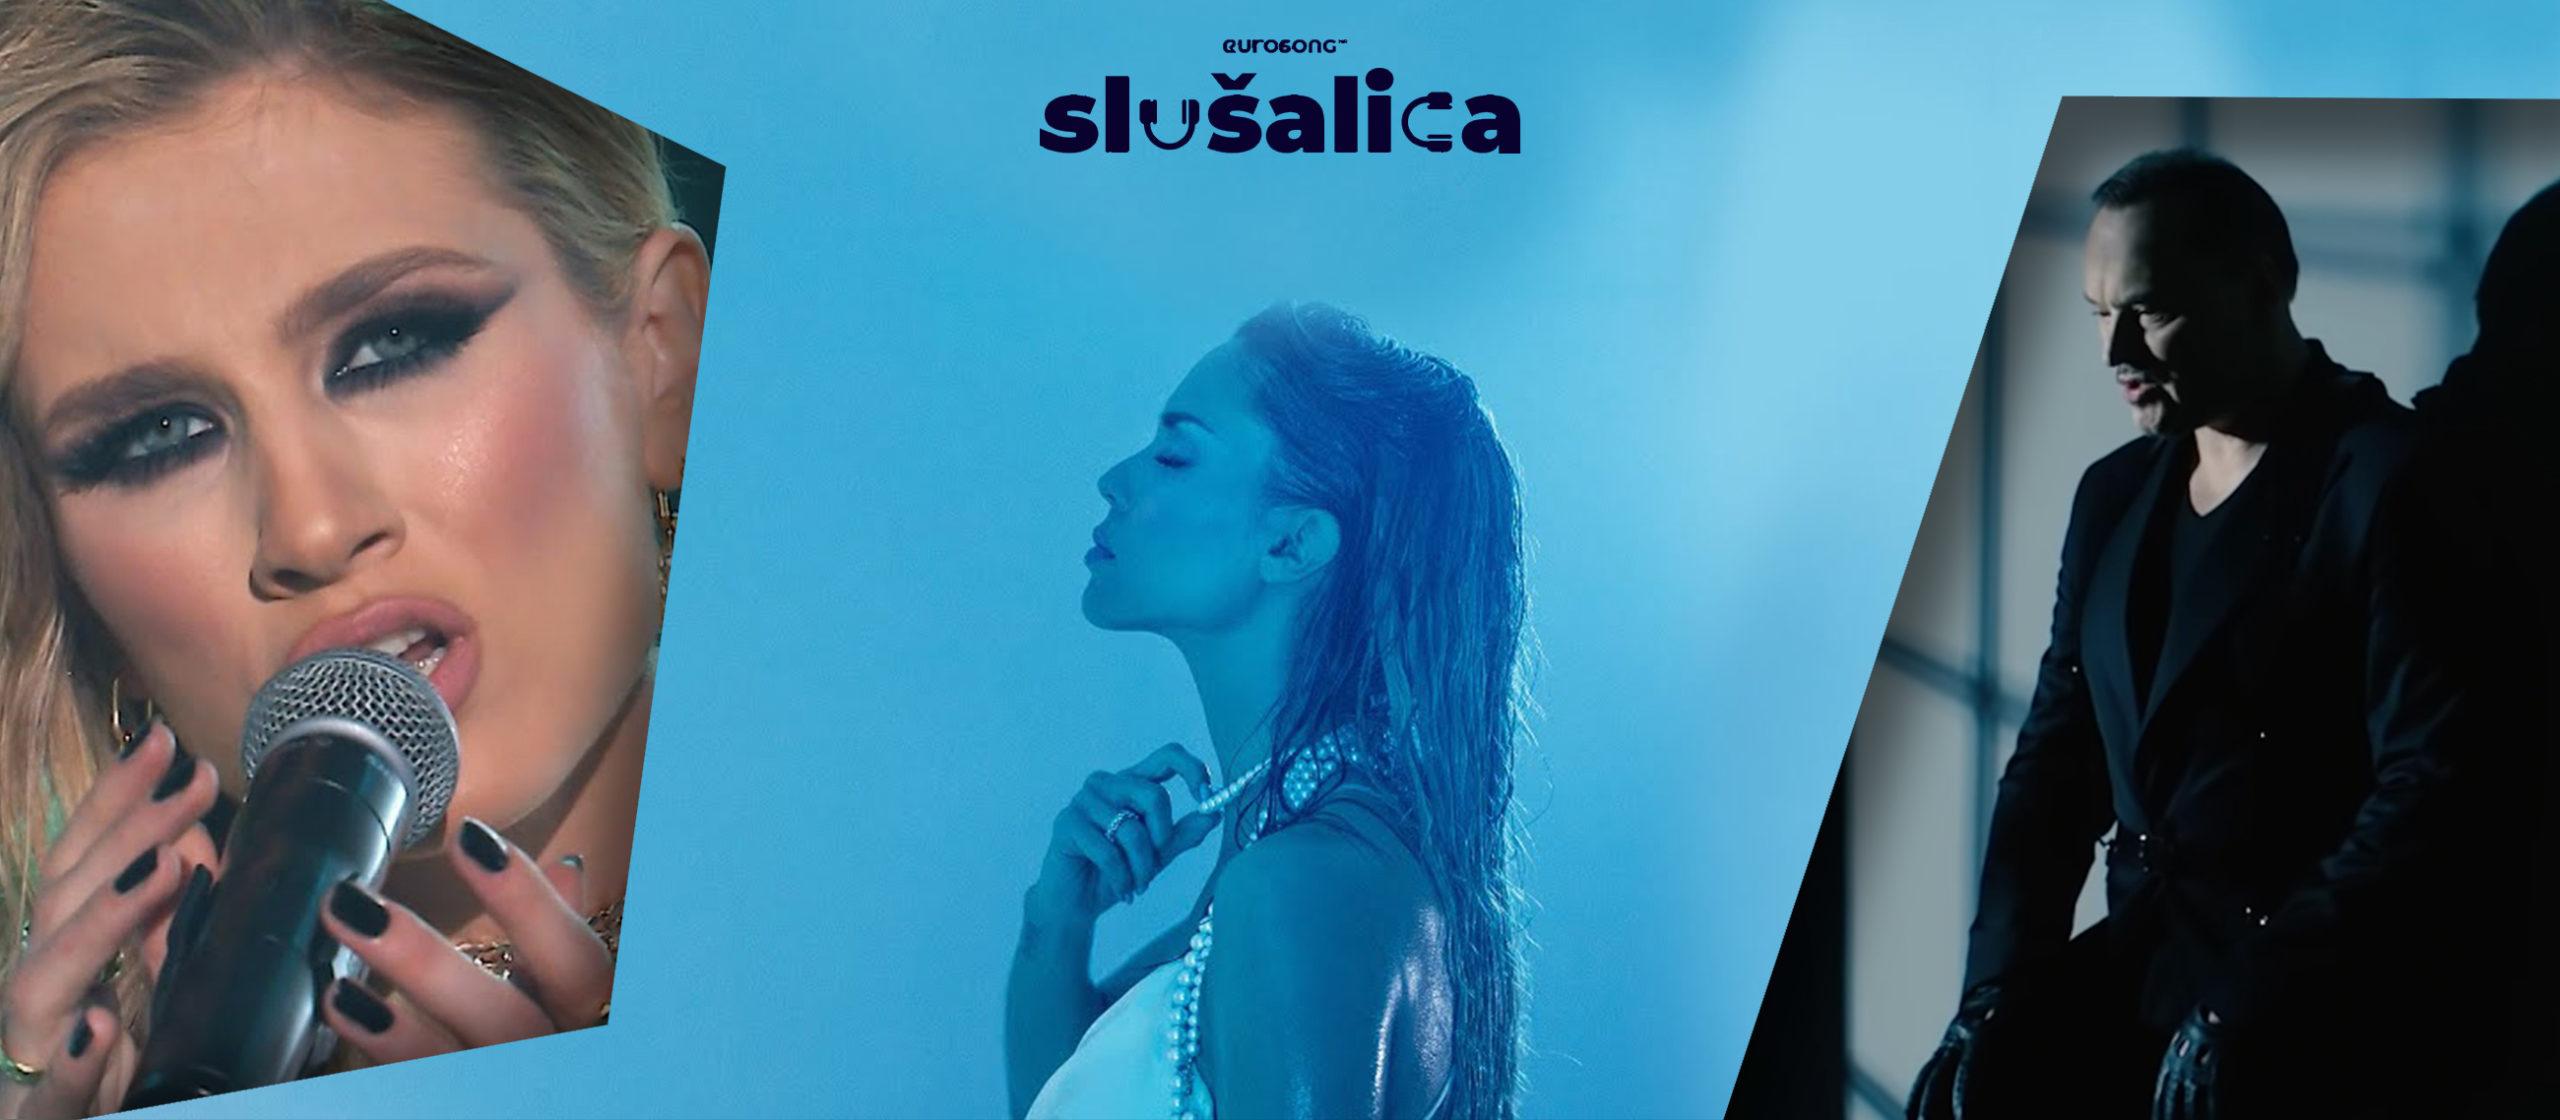 Eurosong Slušalica vizual za domaći hit ožujka/marta 2021